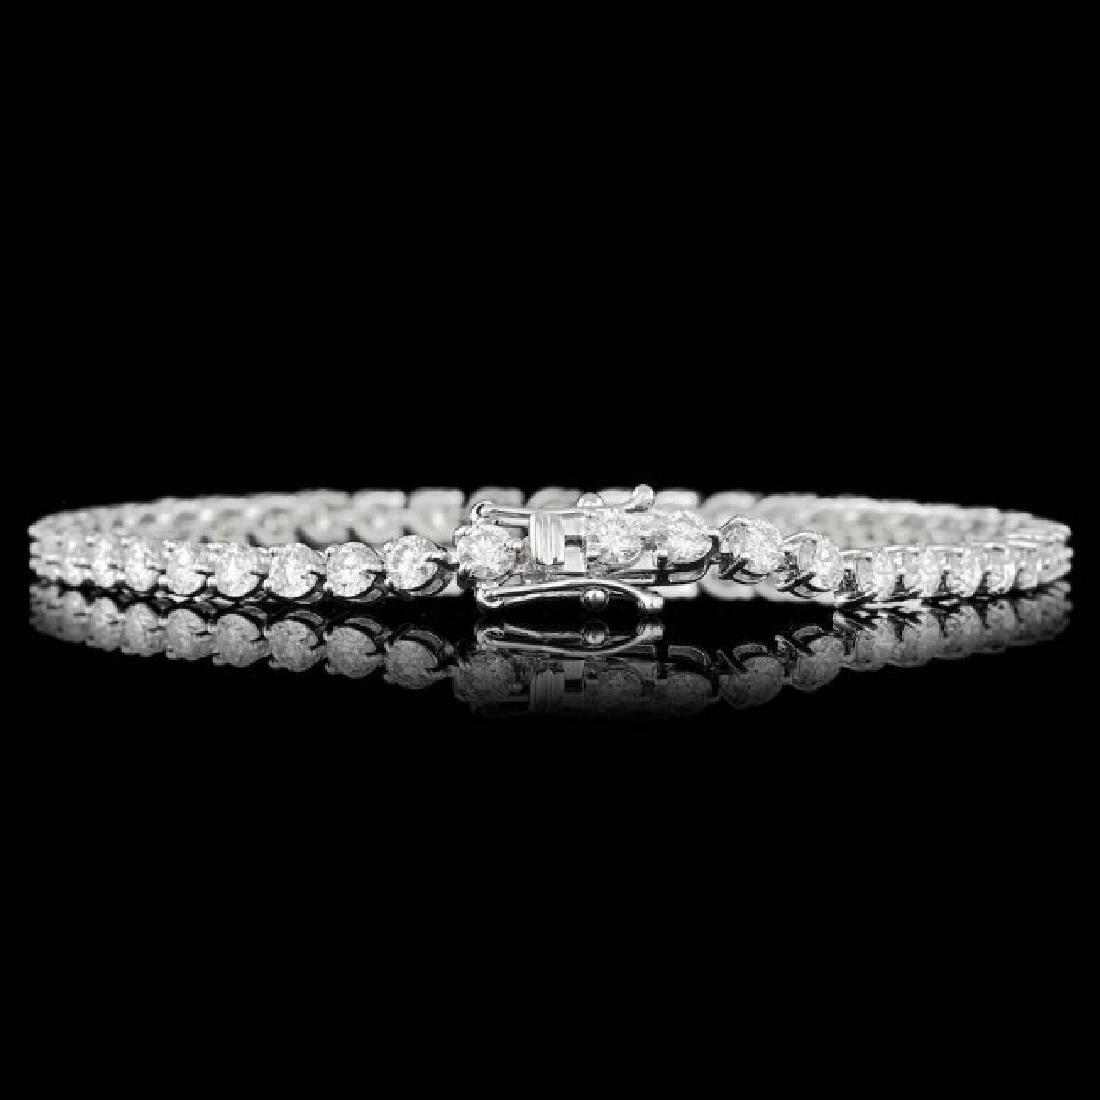 18k White Gold 6.25ct Diamond Bracelet - 3